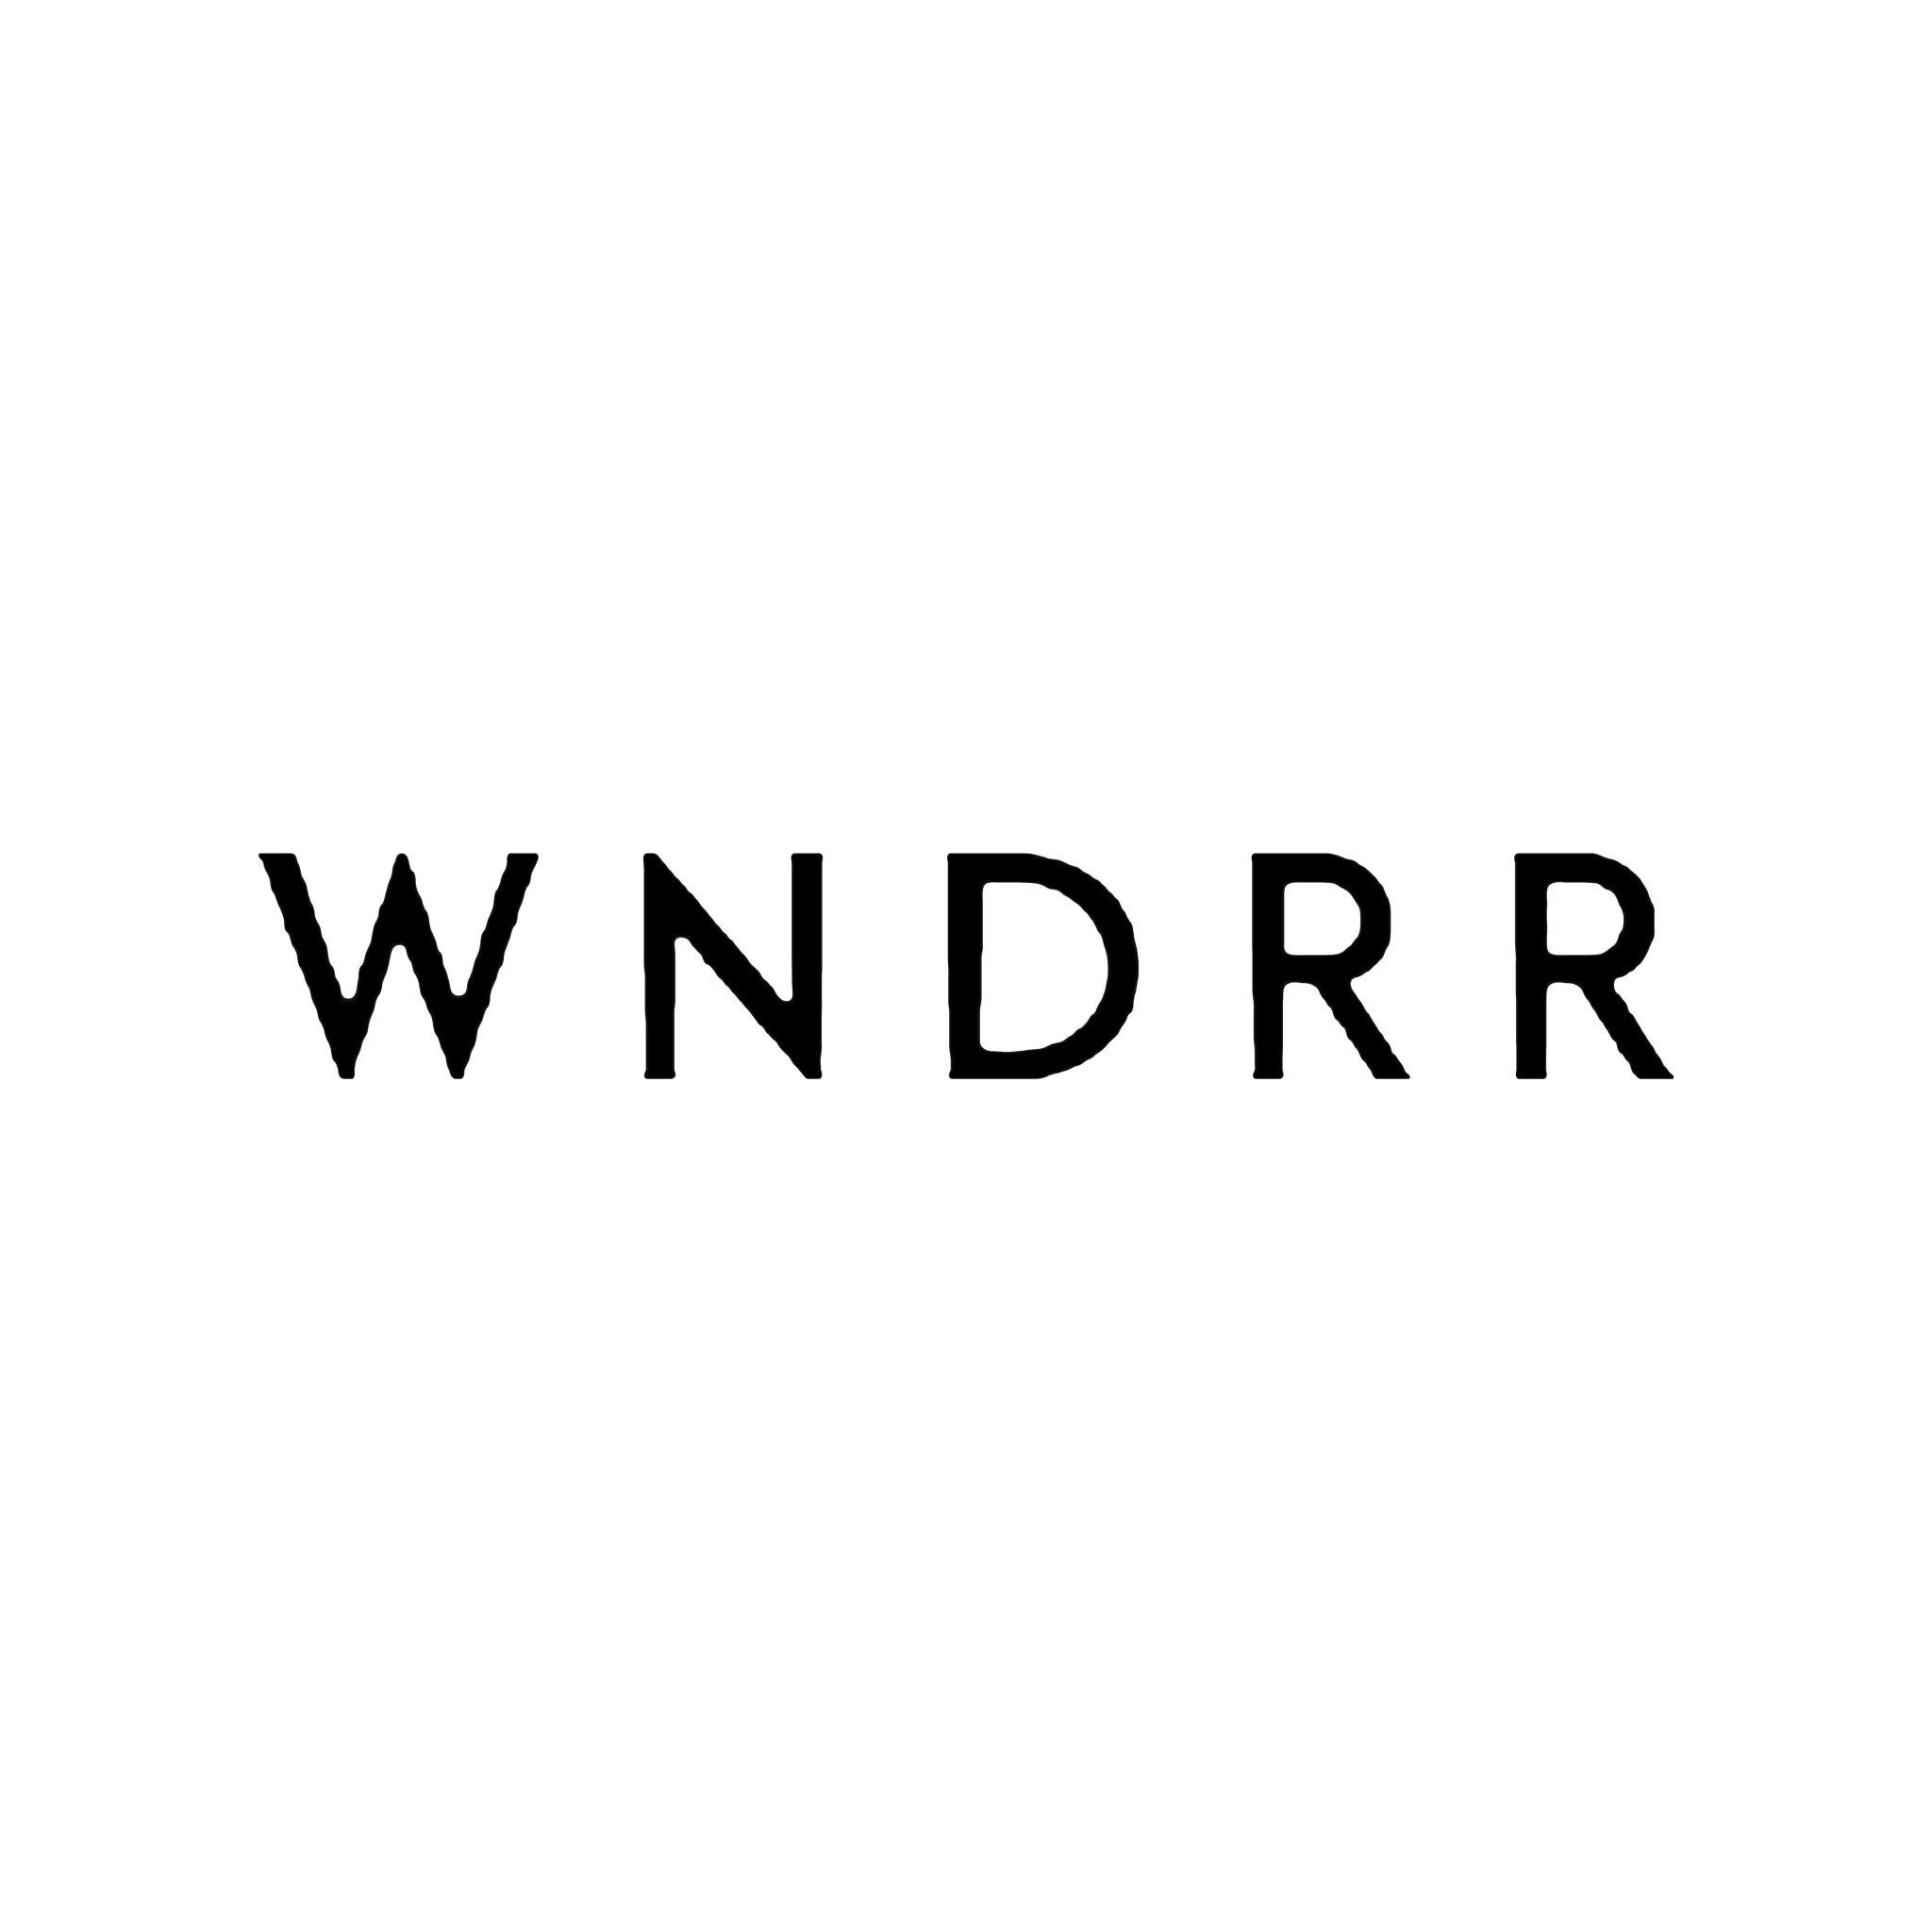 WNDRR